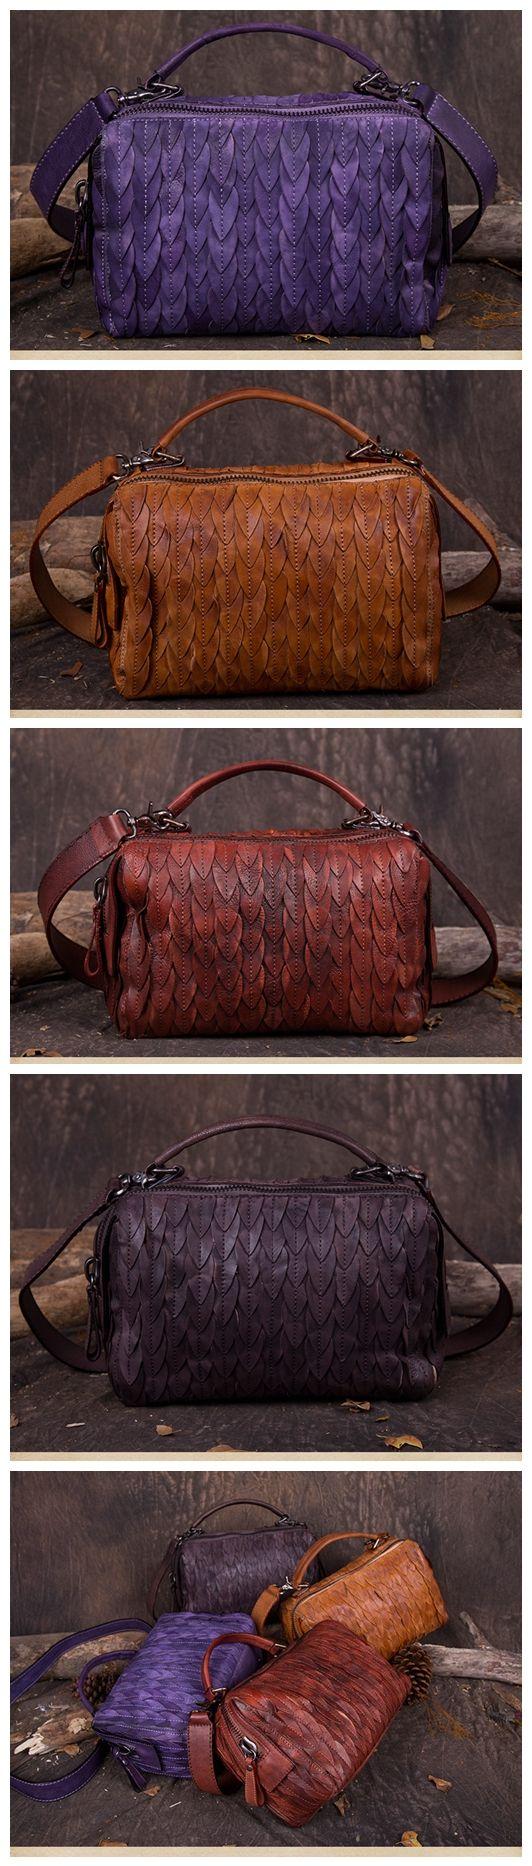 Women's Fashion Leather Handbag Messenger Bag Shoulder Bag Small Satchel in Brown DD101 Overview: Design: Women Fashion Handbag In Stock: 3-5 days For Making Leather: Vegetable Tanned Leather Measures